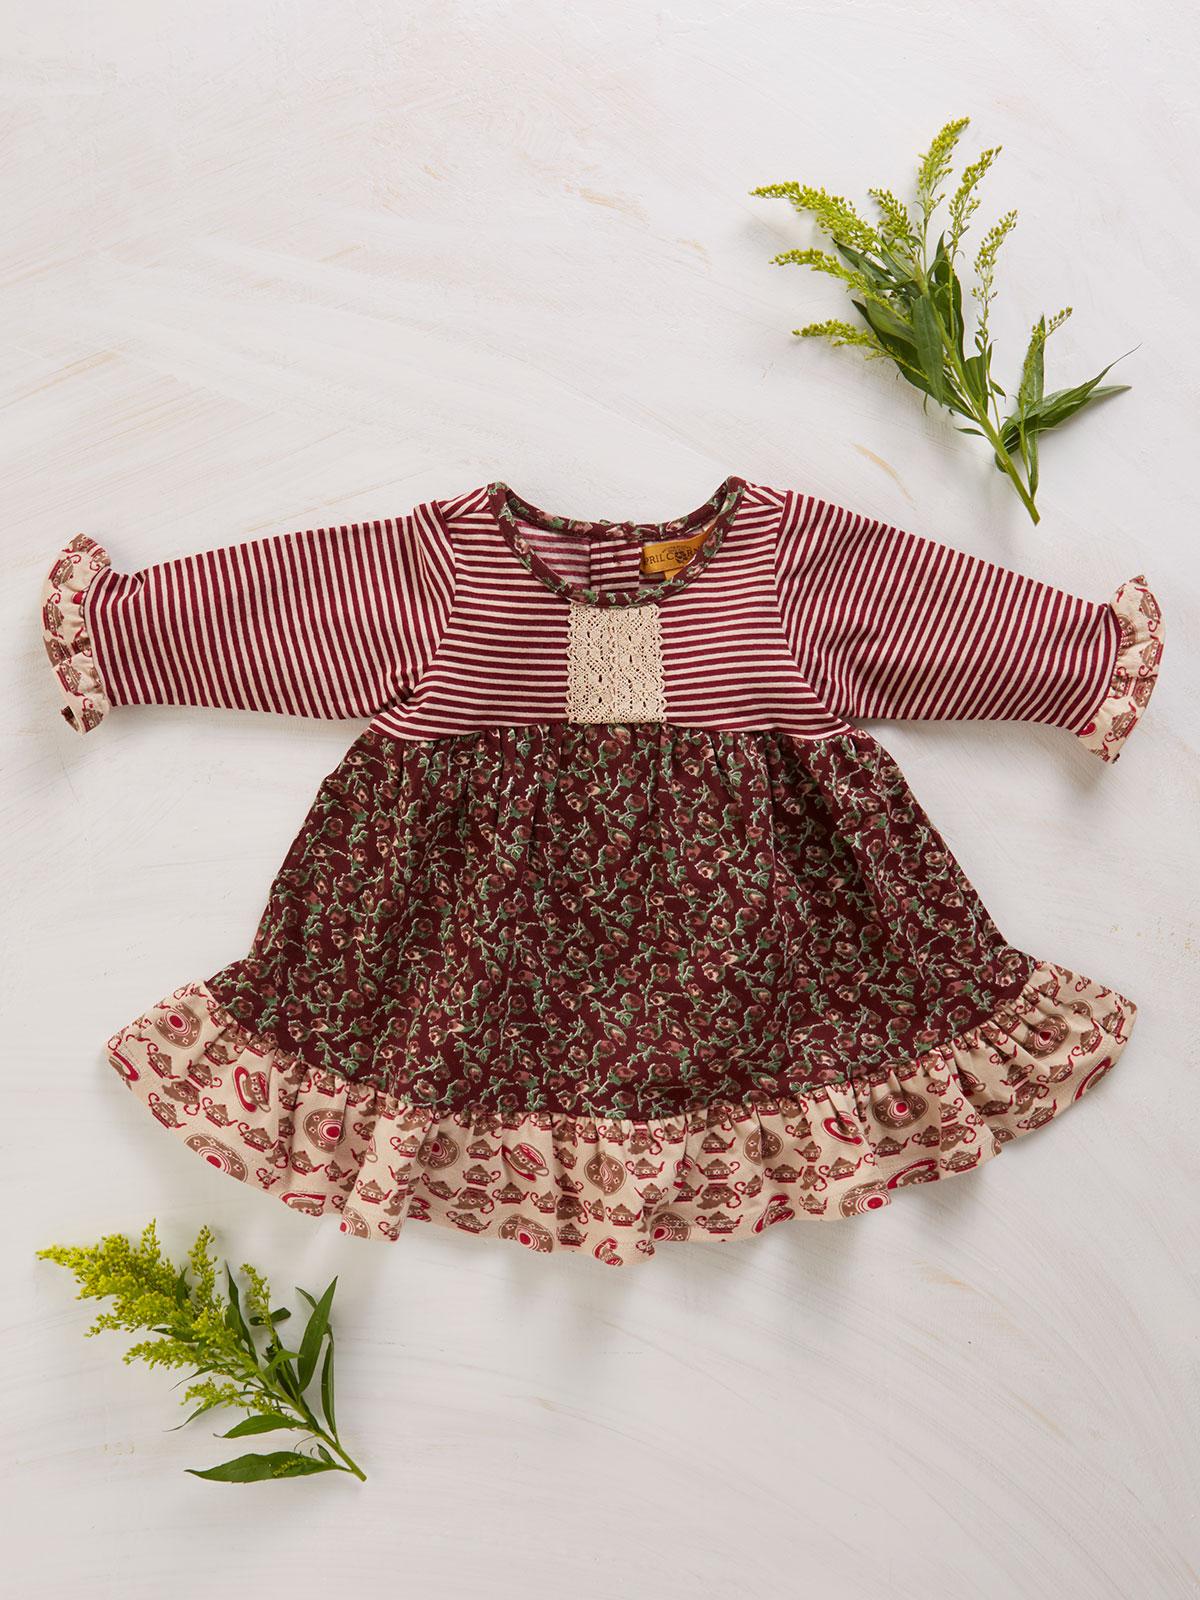 Rosebud Patchwork Baby Dress